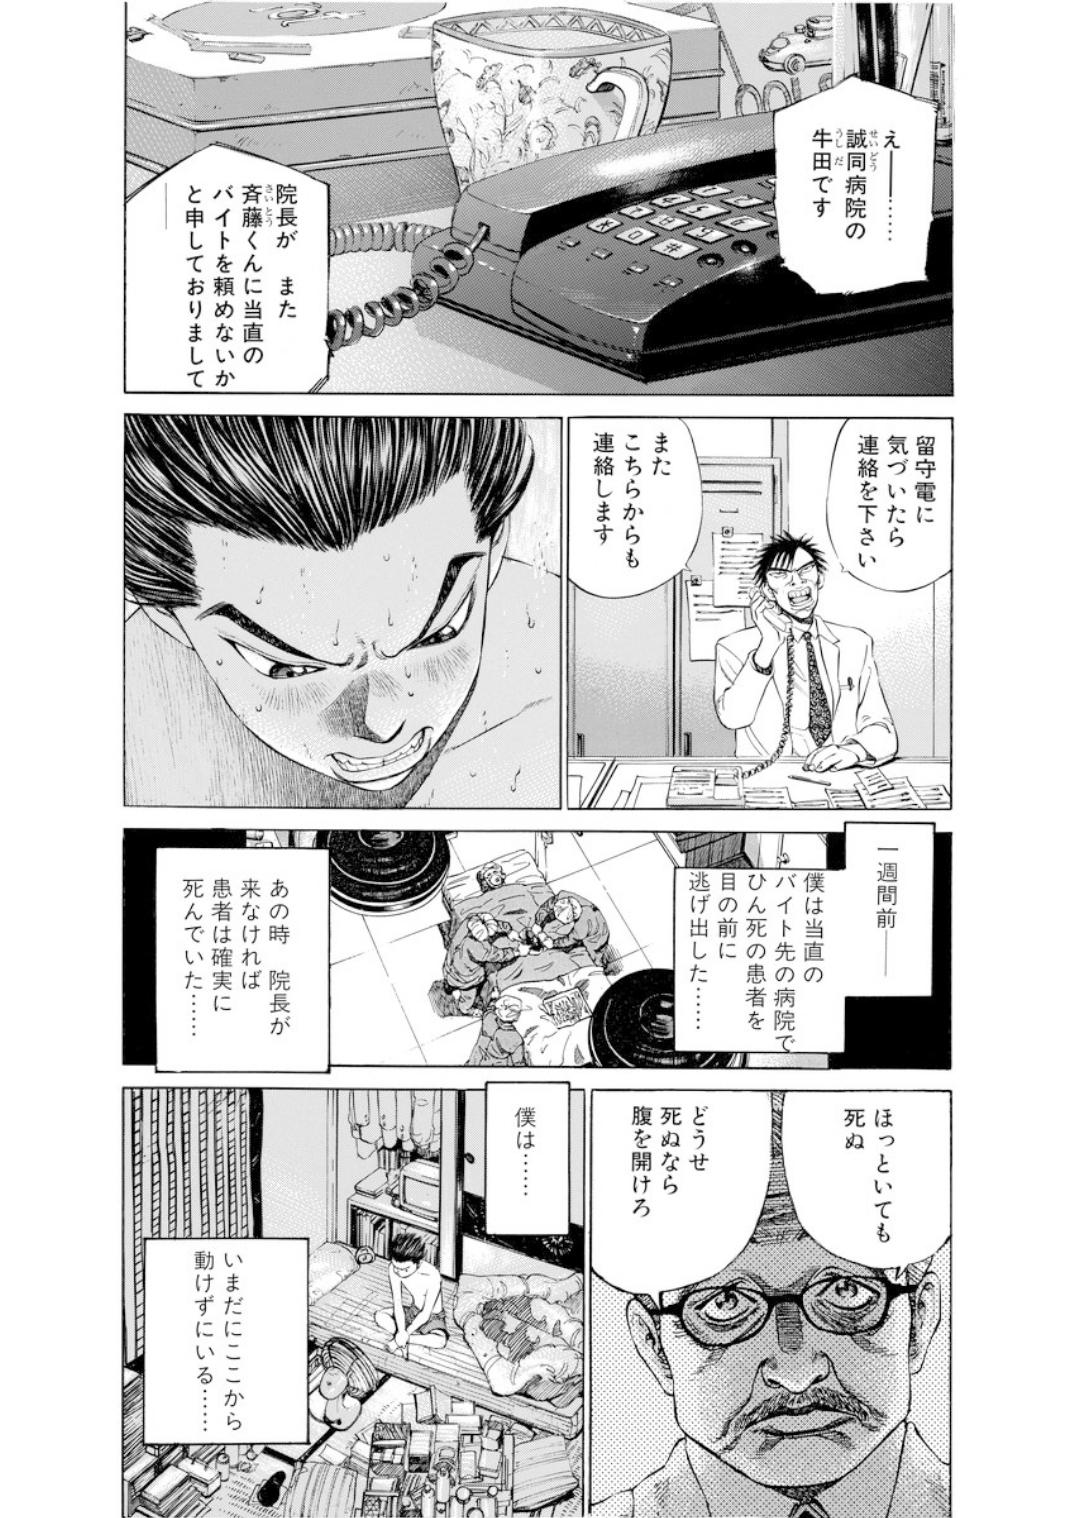 001bj_page-0063.jpg